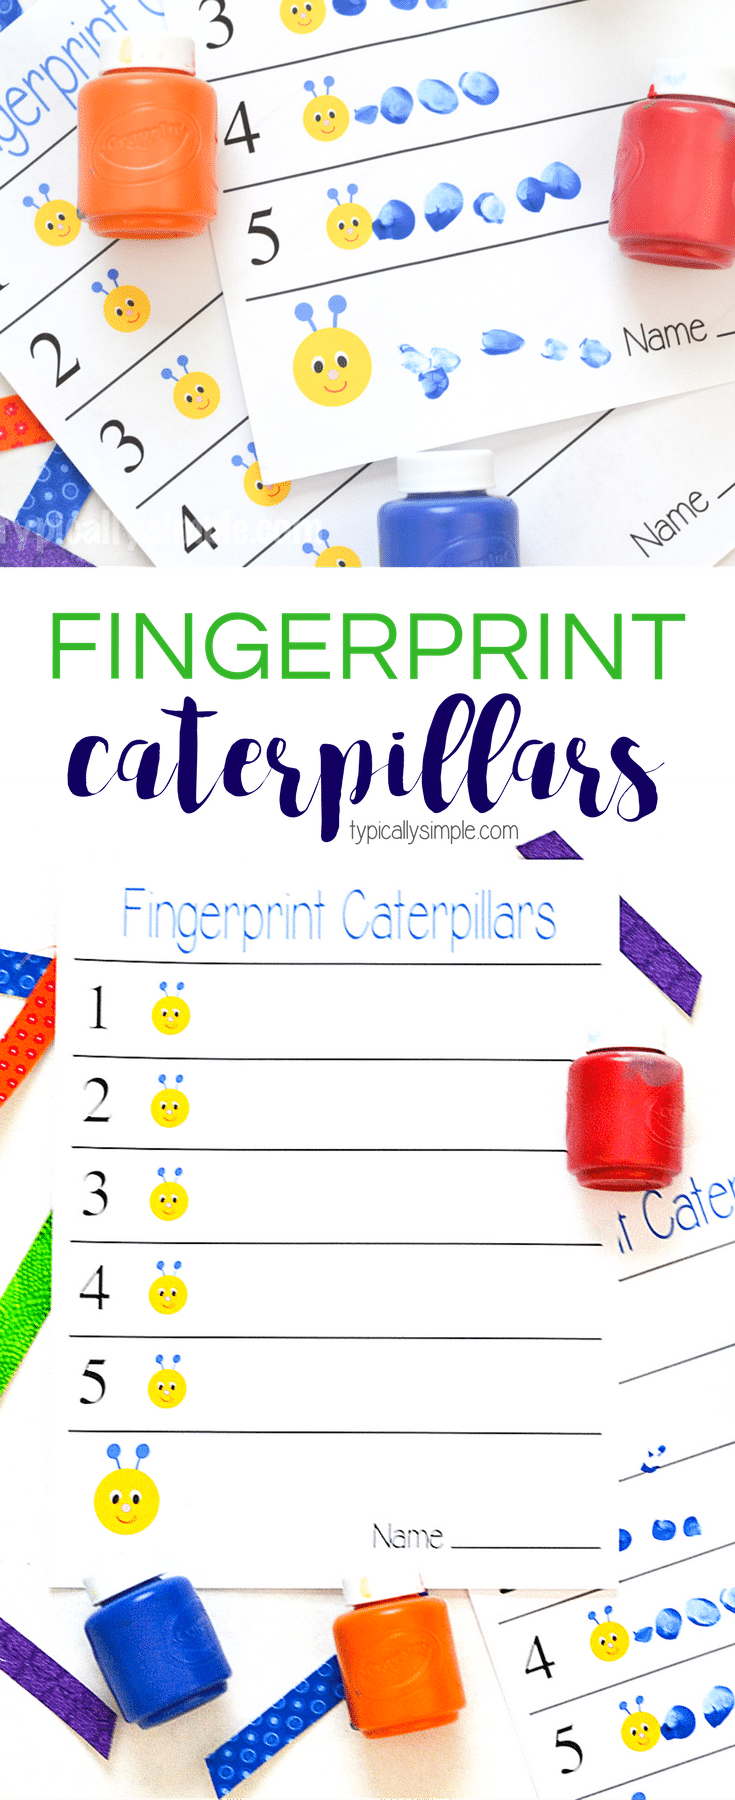 medium resolution of FINGERPRINT CATERPILLARS CRAFT - Homeschool Printables for Free